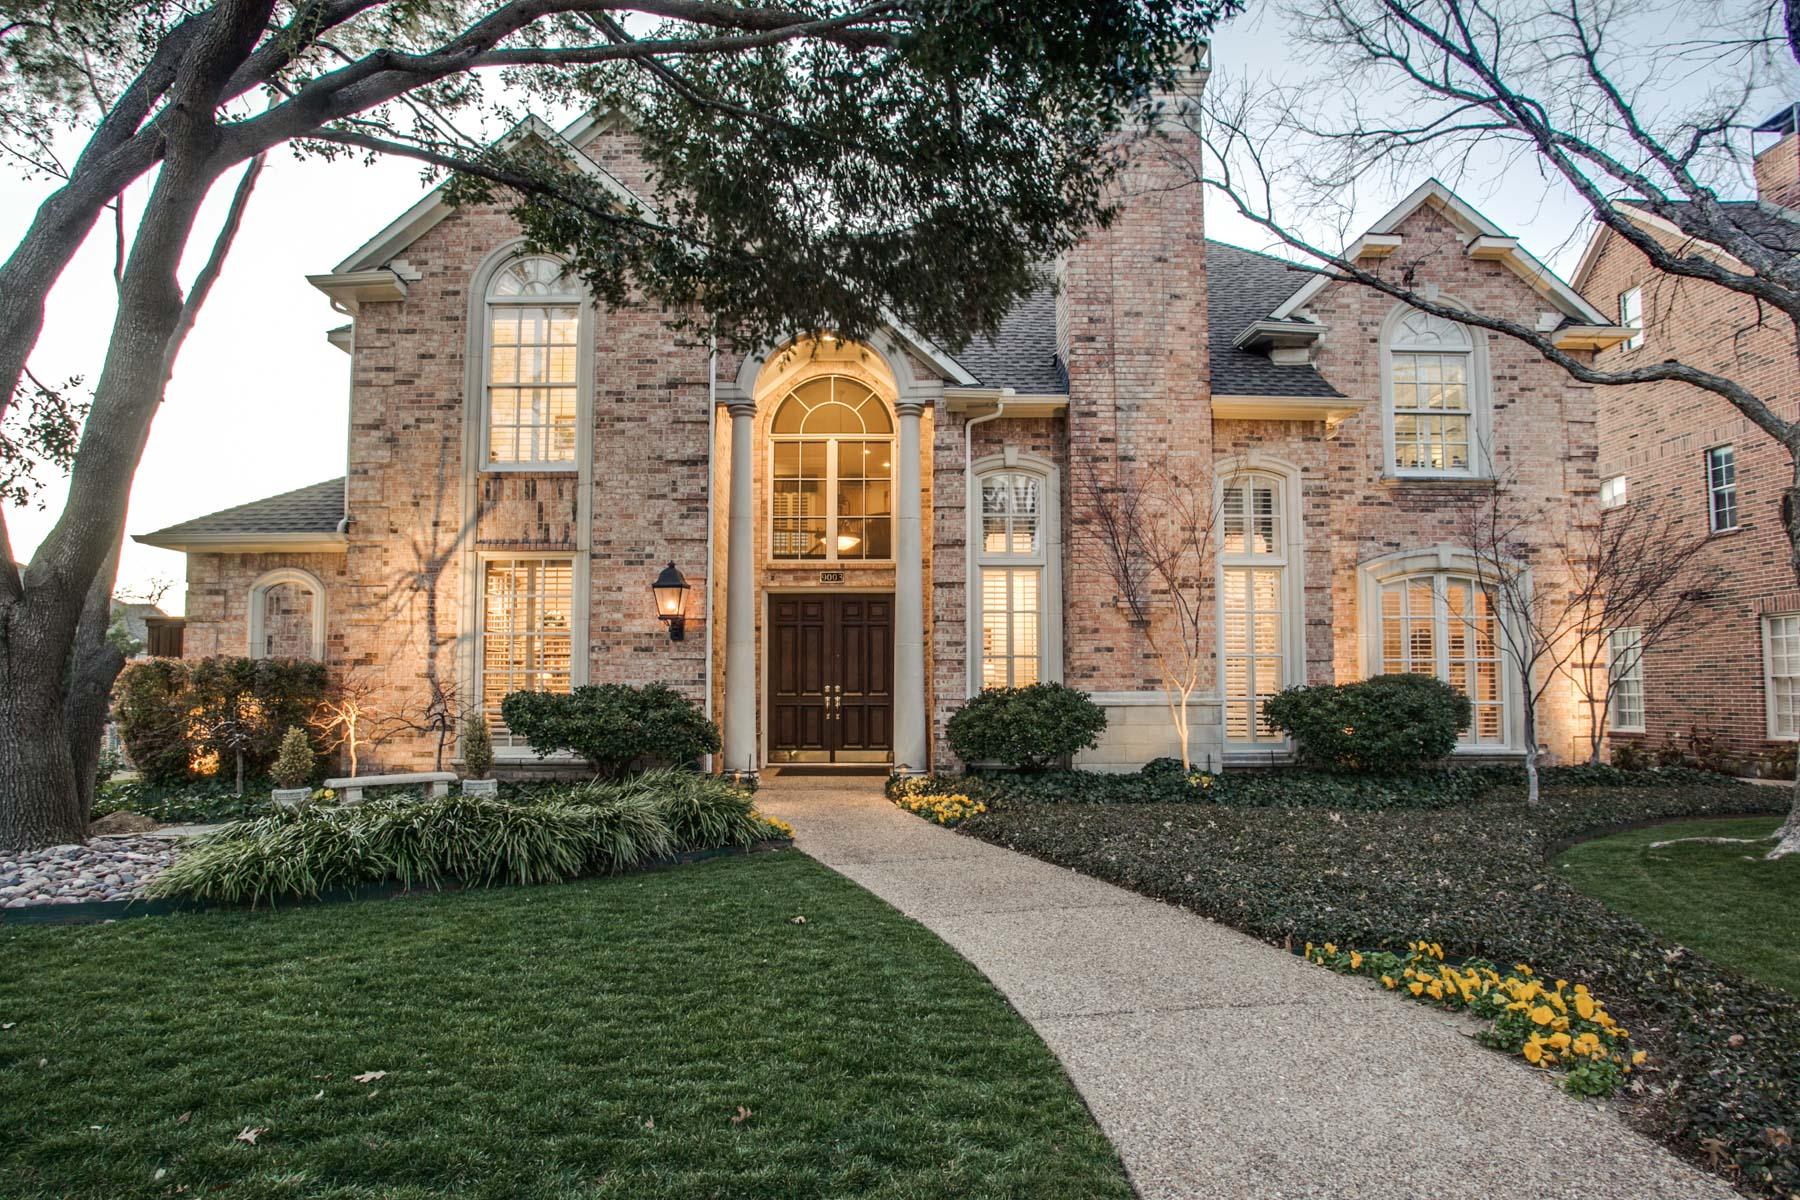 Casa para uma família para Venda às Lake Highlands Energy Efficient Traditional 9003 Prominence Drive Dallas, Texas 75238 Estados Unidos